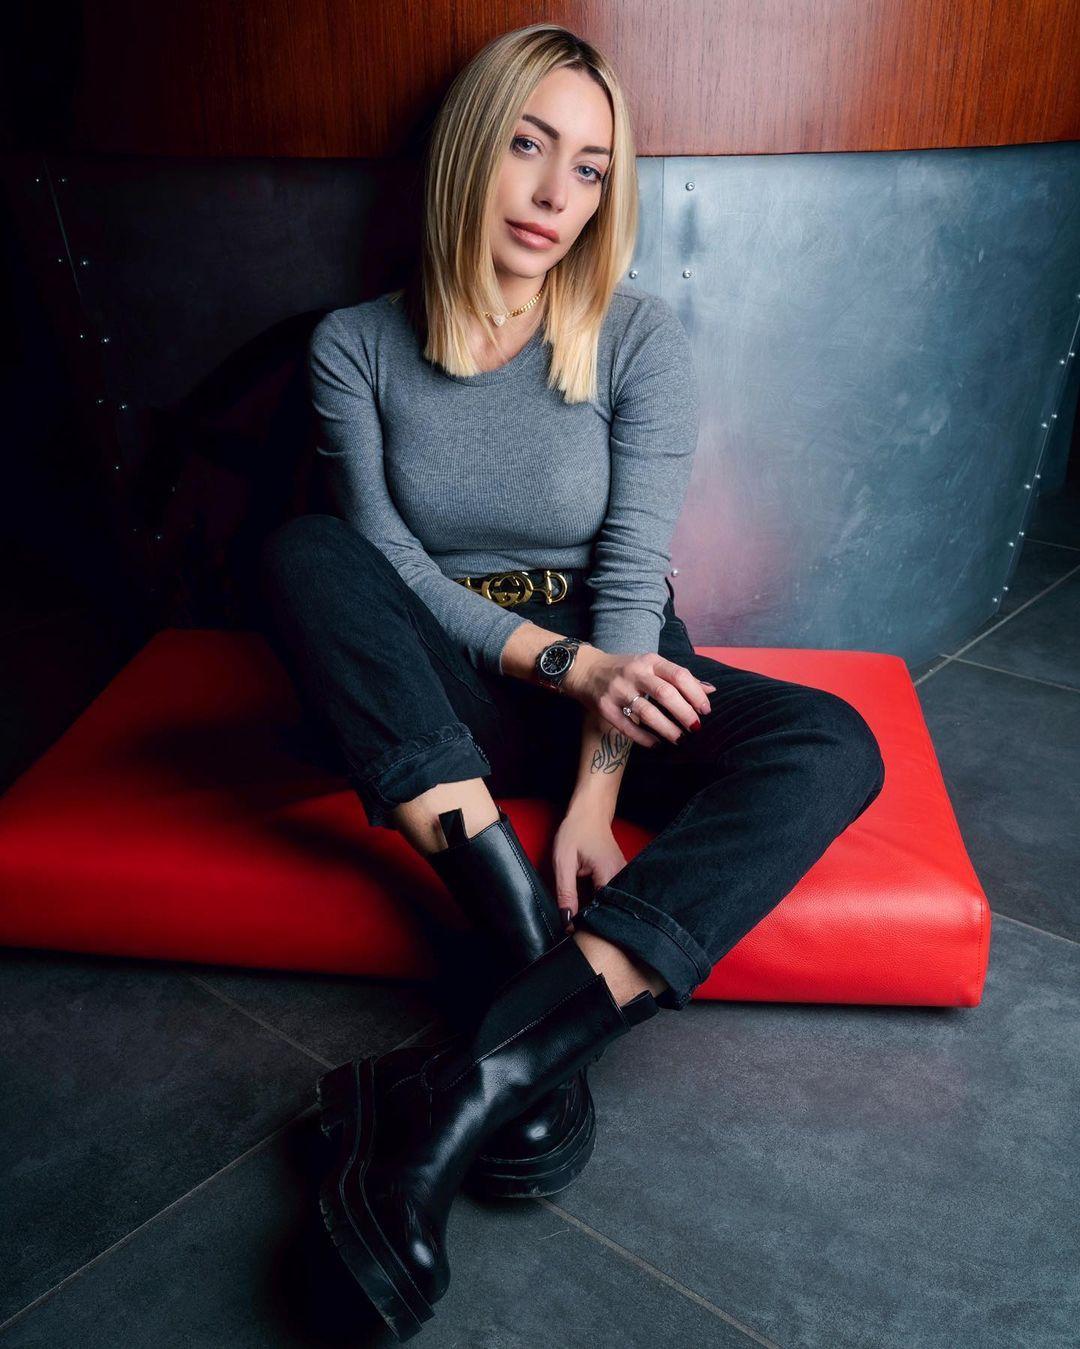 Karina-Cascella-Wallpapers-Insta-Fit-Bio-3